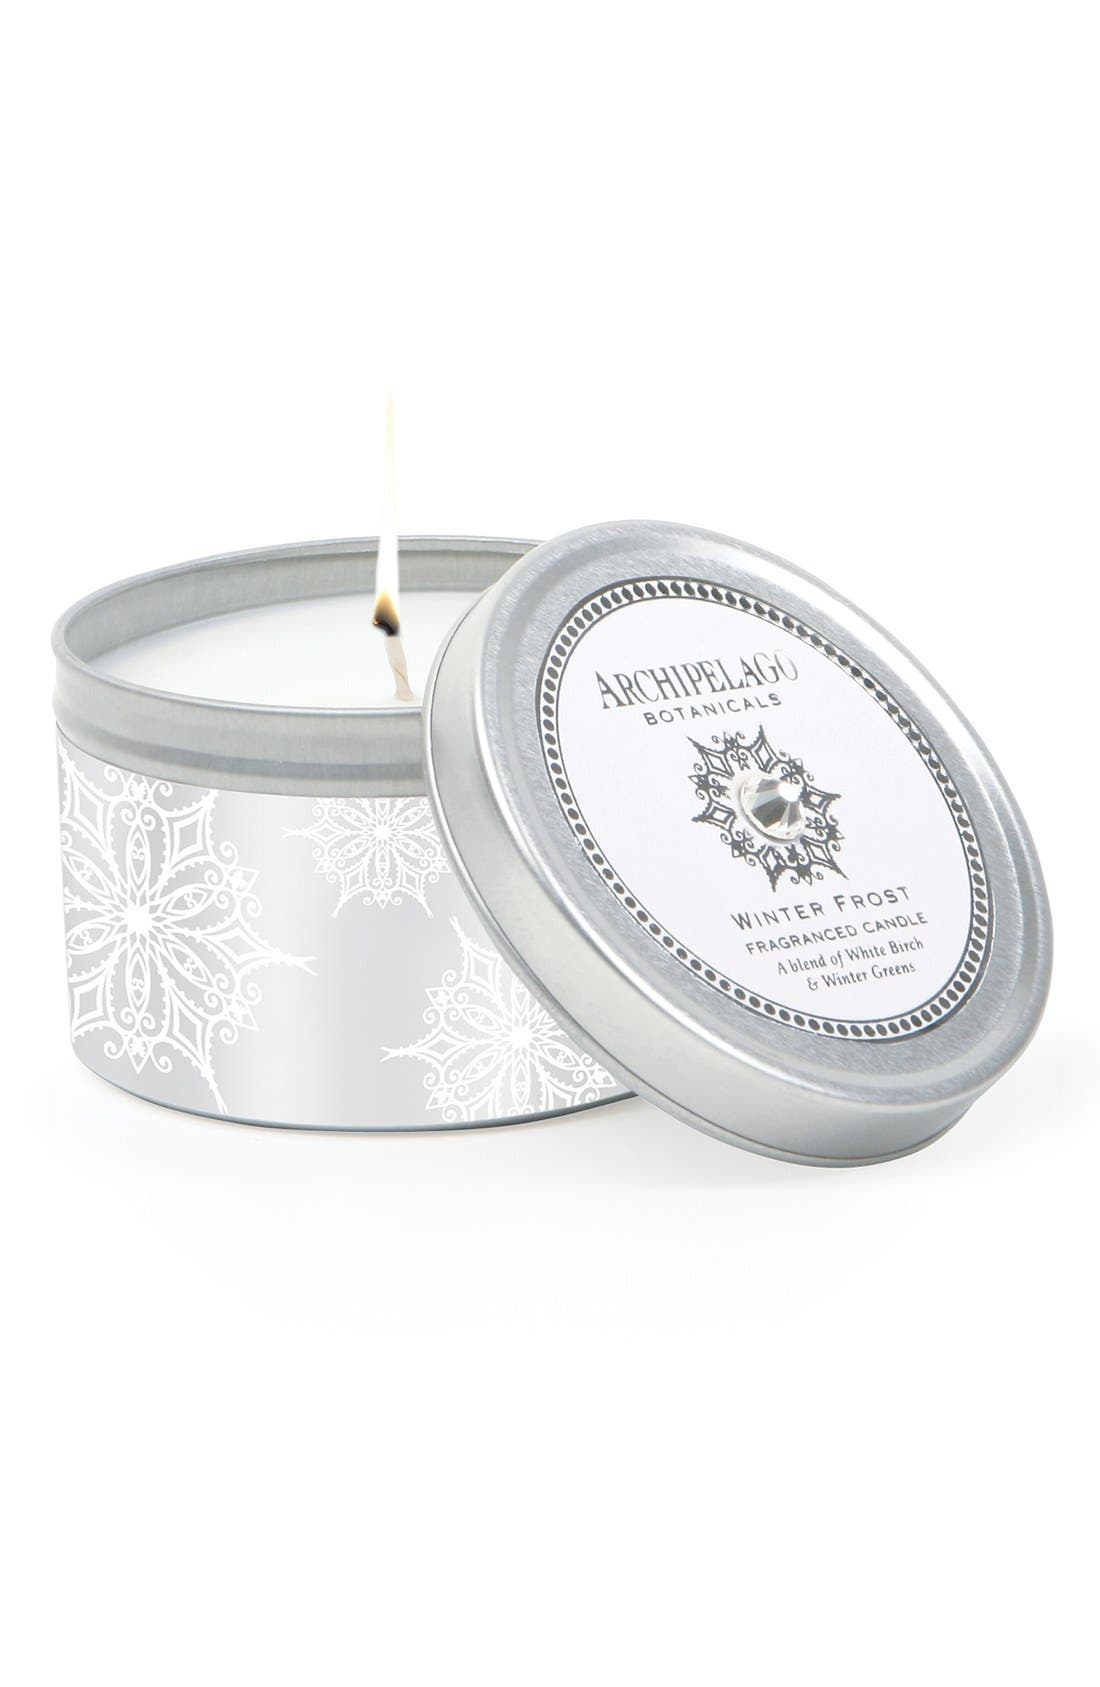 Alternate Image 1 Selected - Archipelago Botanicals 'Winter Frost' Travel Tin Candle